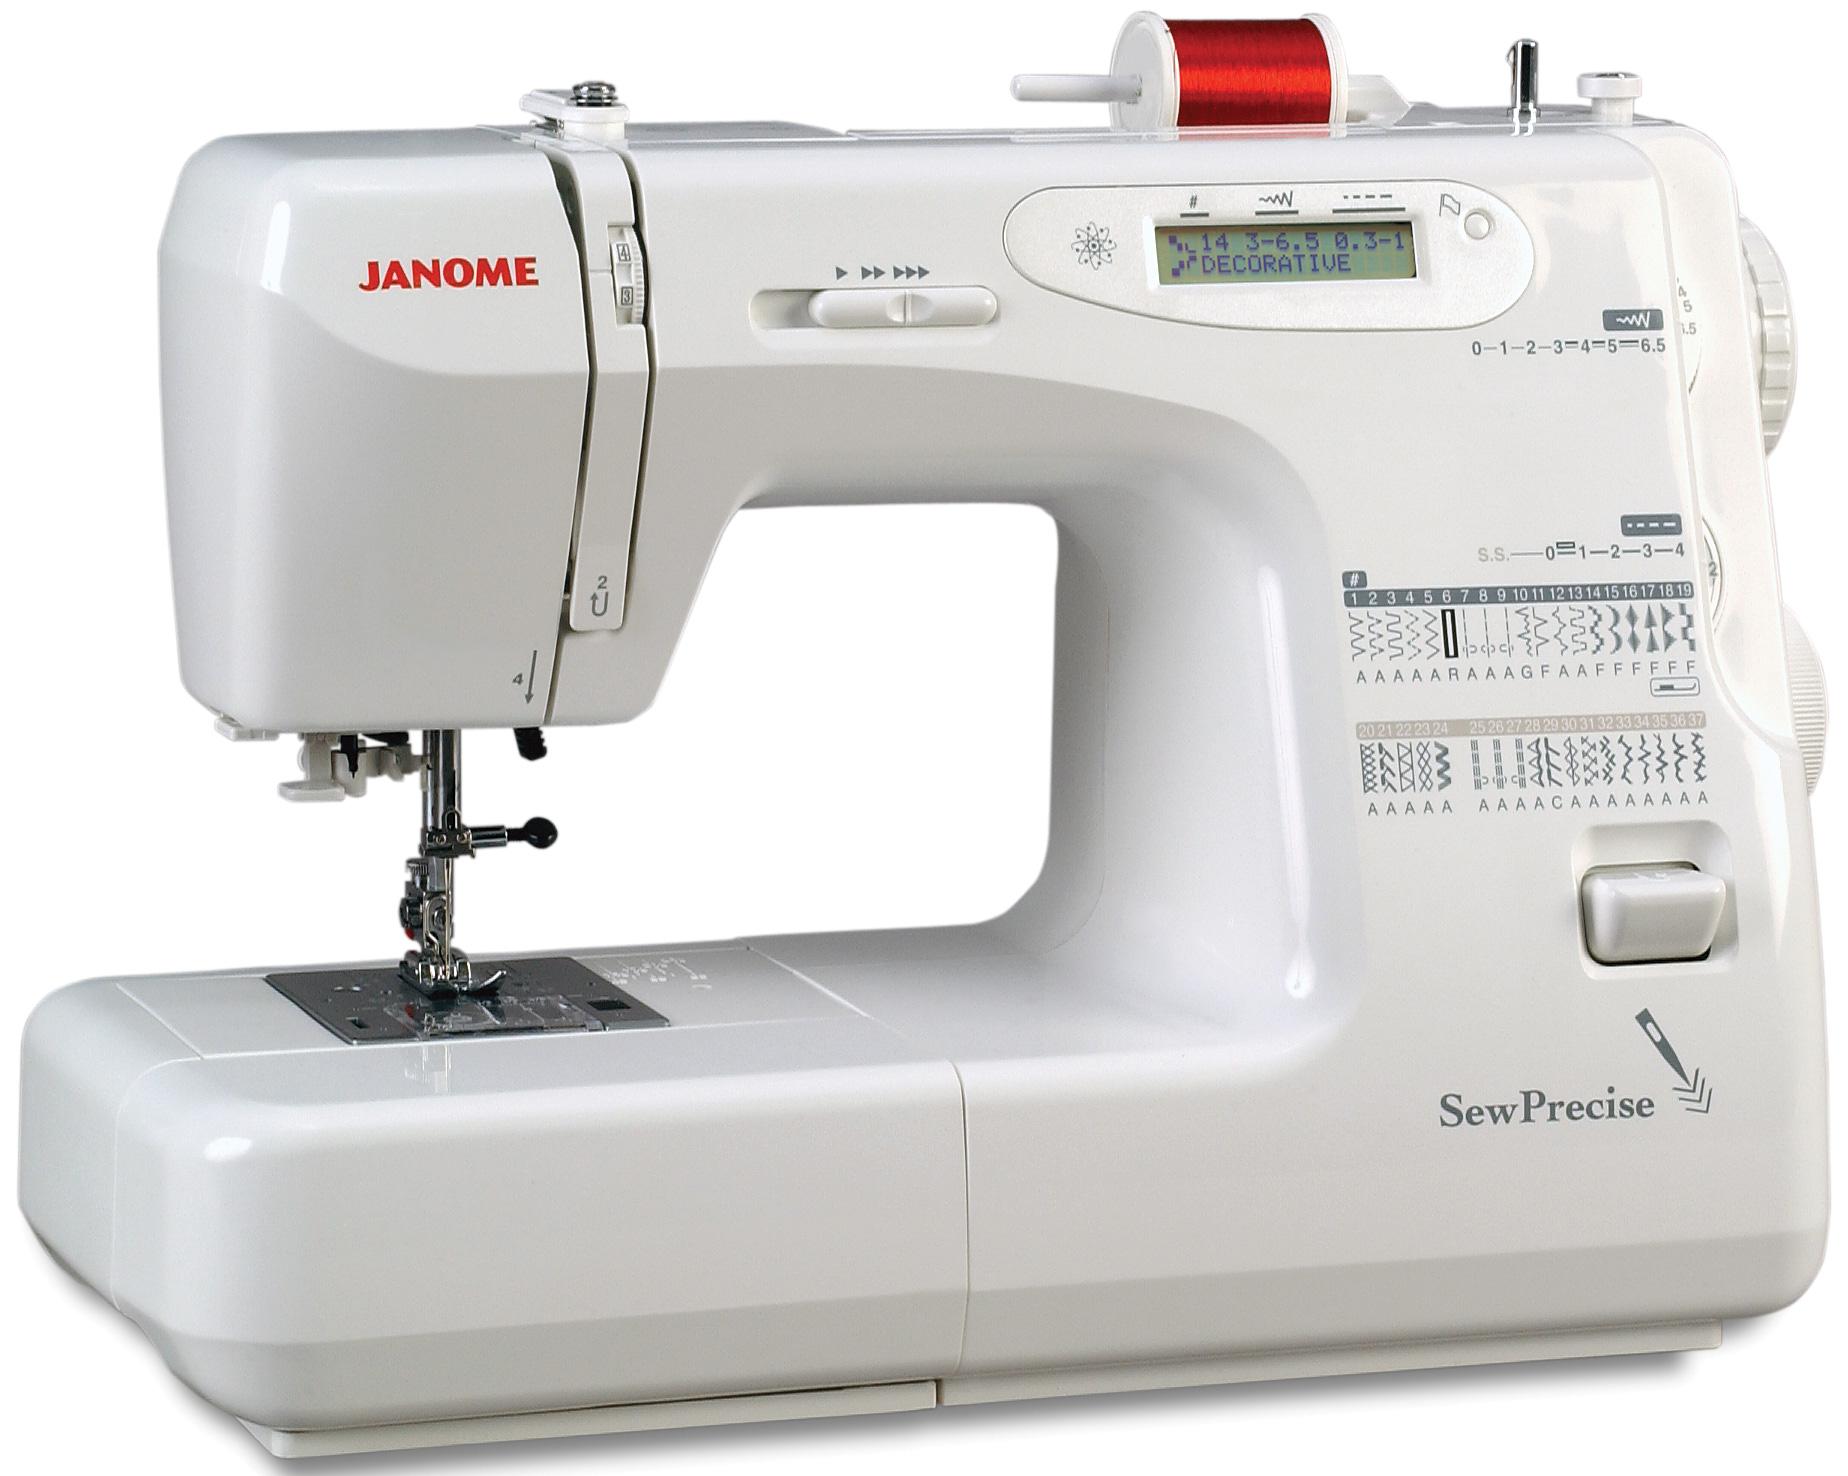 Janome Sewing Machine Cabinet Nagpurentrepreneurs